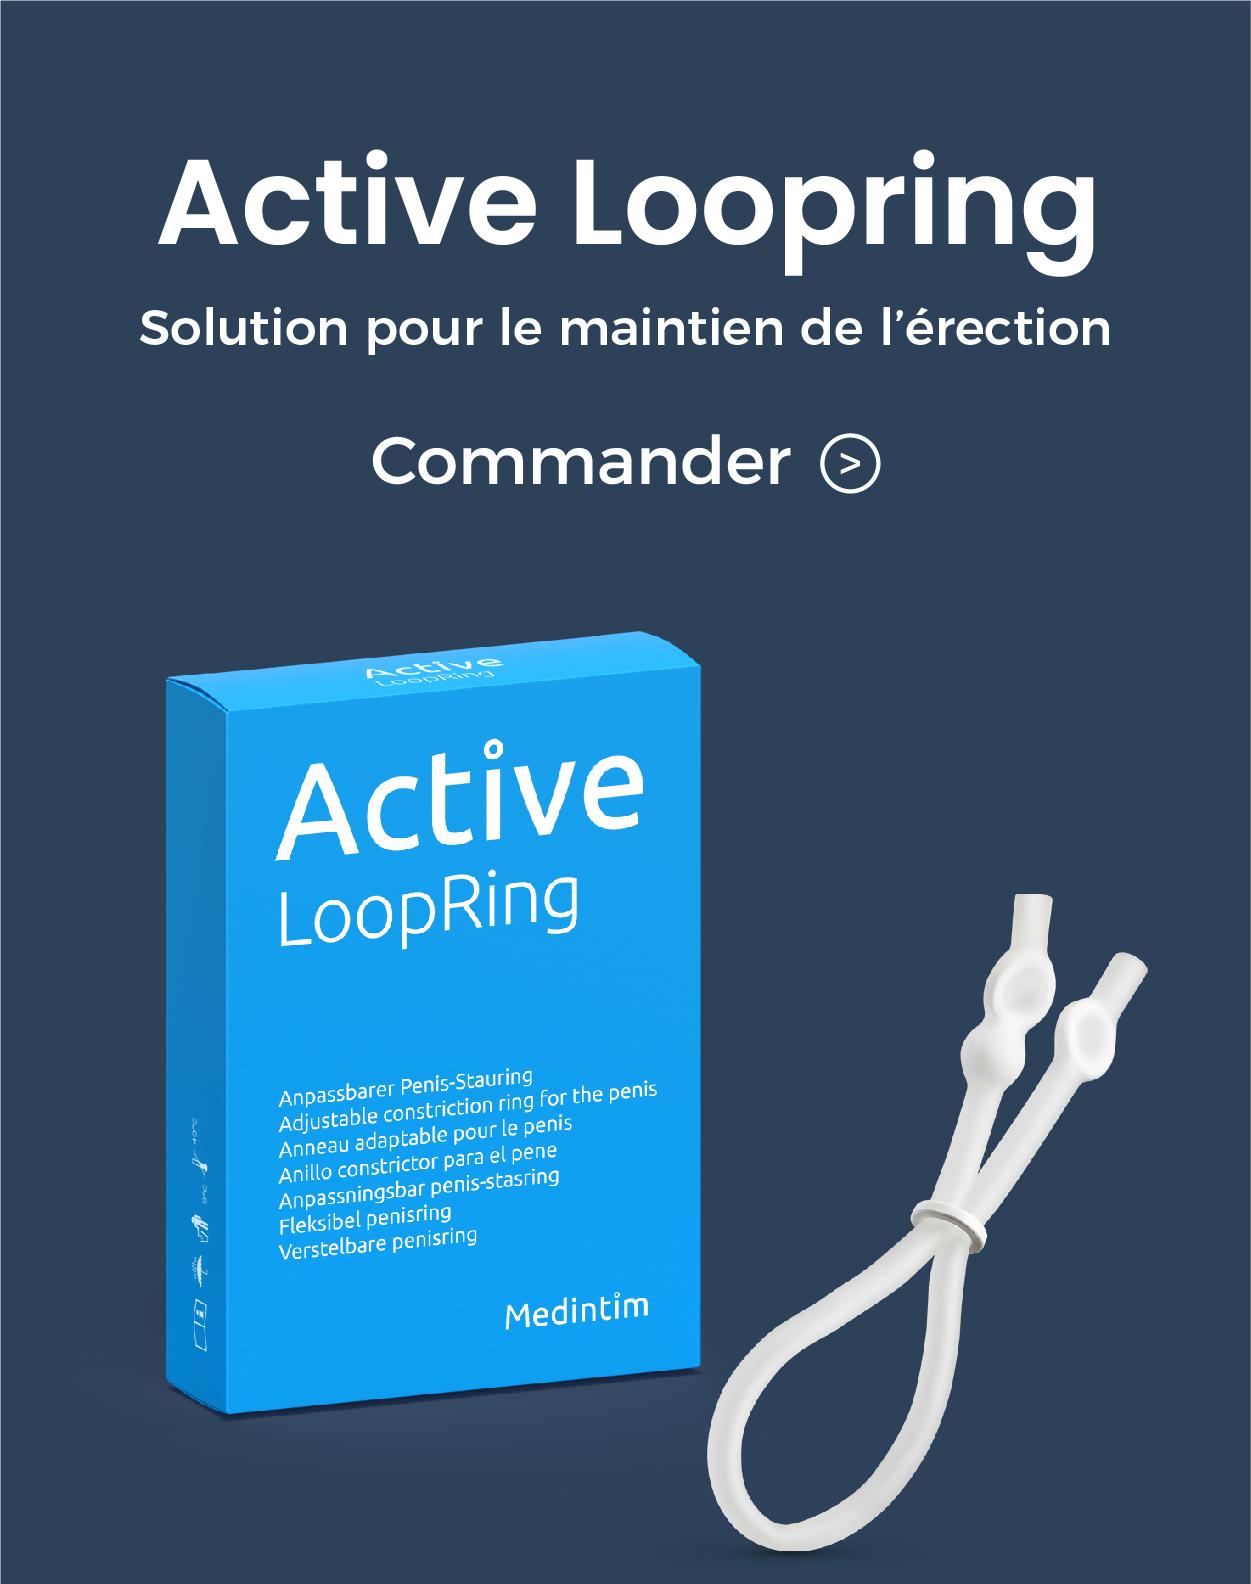 active loopring de medintim dispositif medical pour le maintien de l'erection